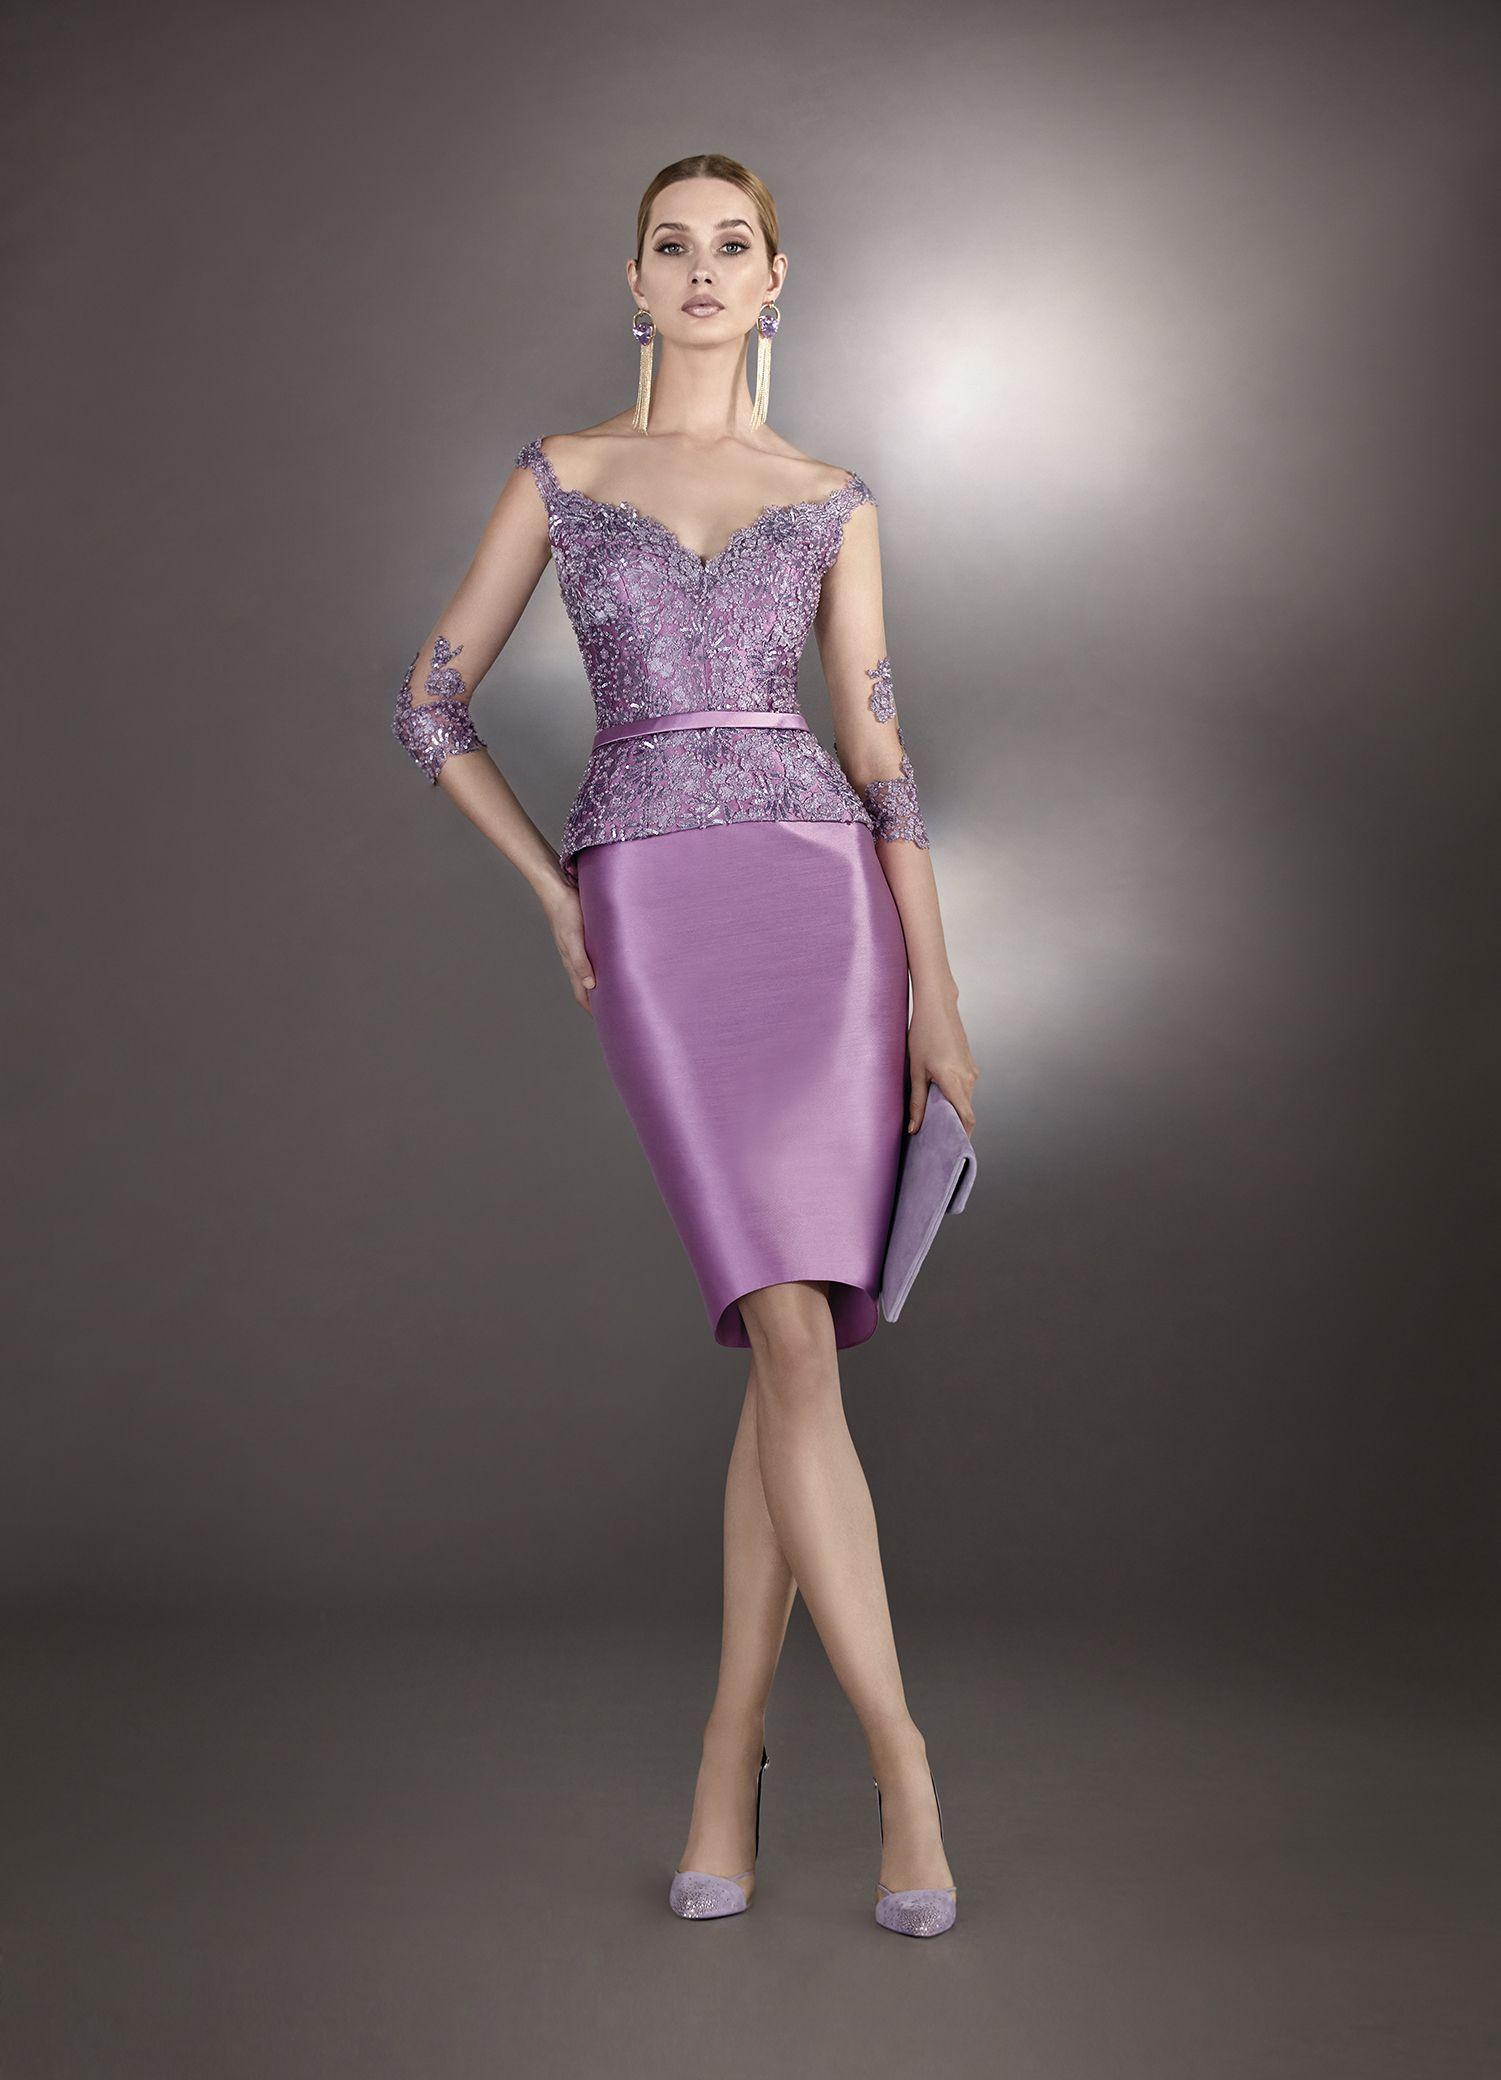 95f139143 Hannibal Laguna Atelier Fiesta 2017  Couture  Vestidosdefiesta   HannibalLaguna  Atelier